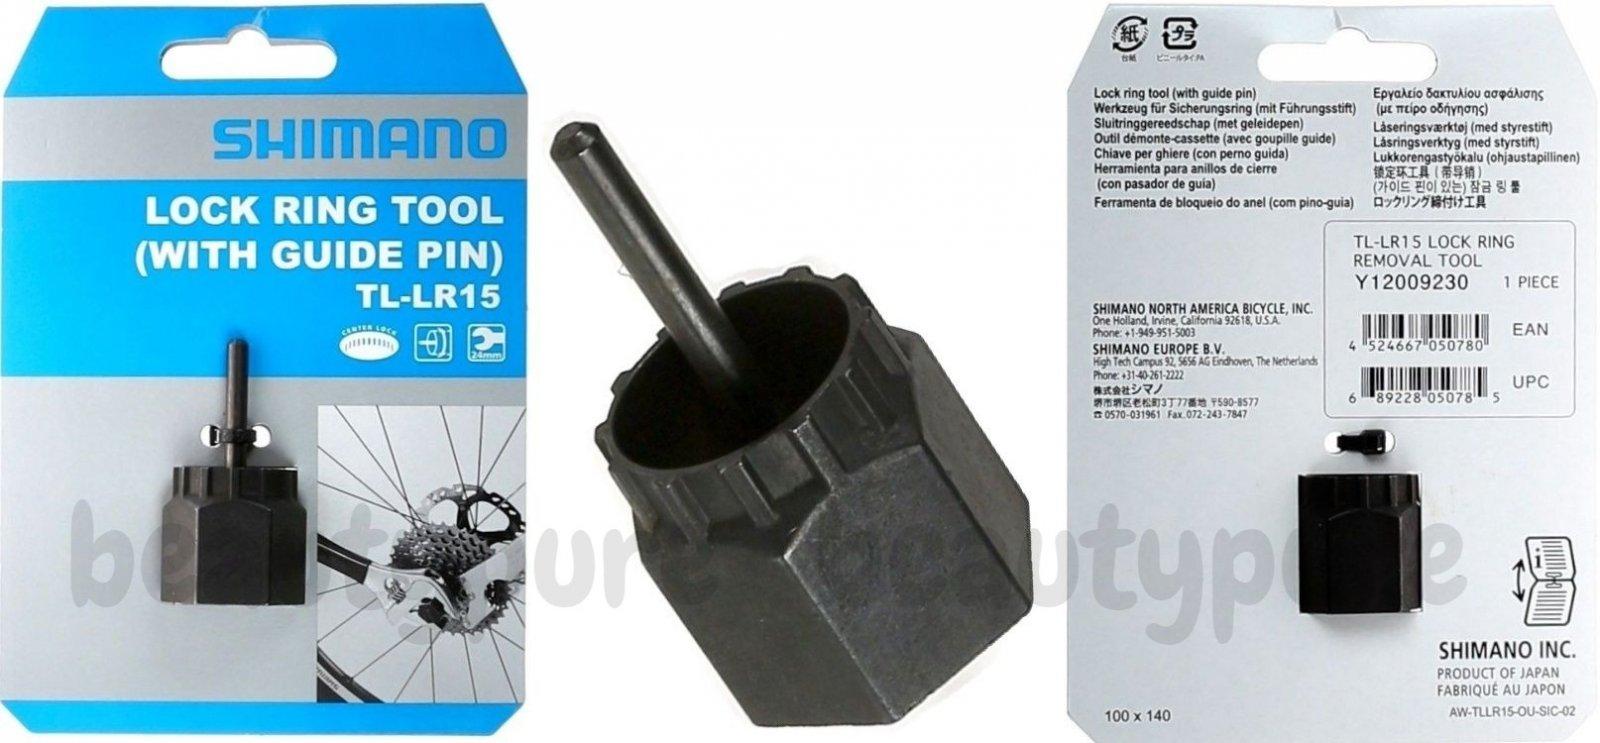 Shimano TL-LR15 Lockring Tool with Axle Pin